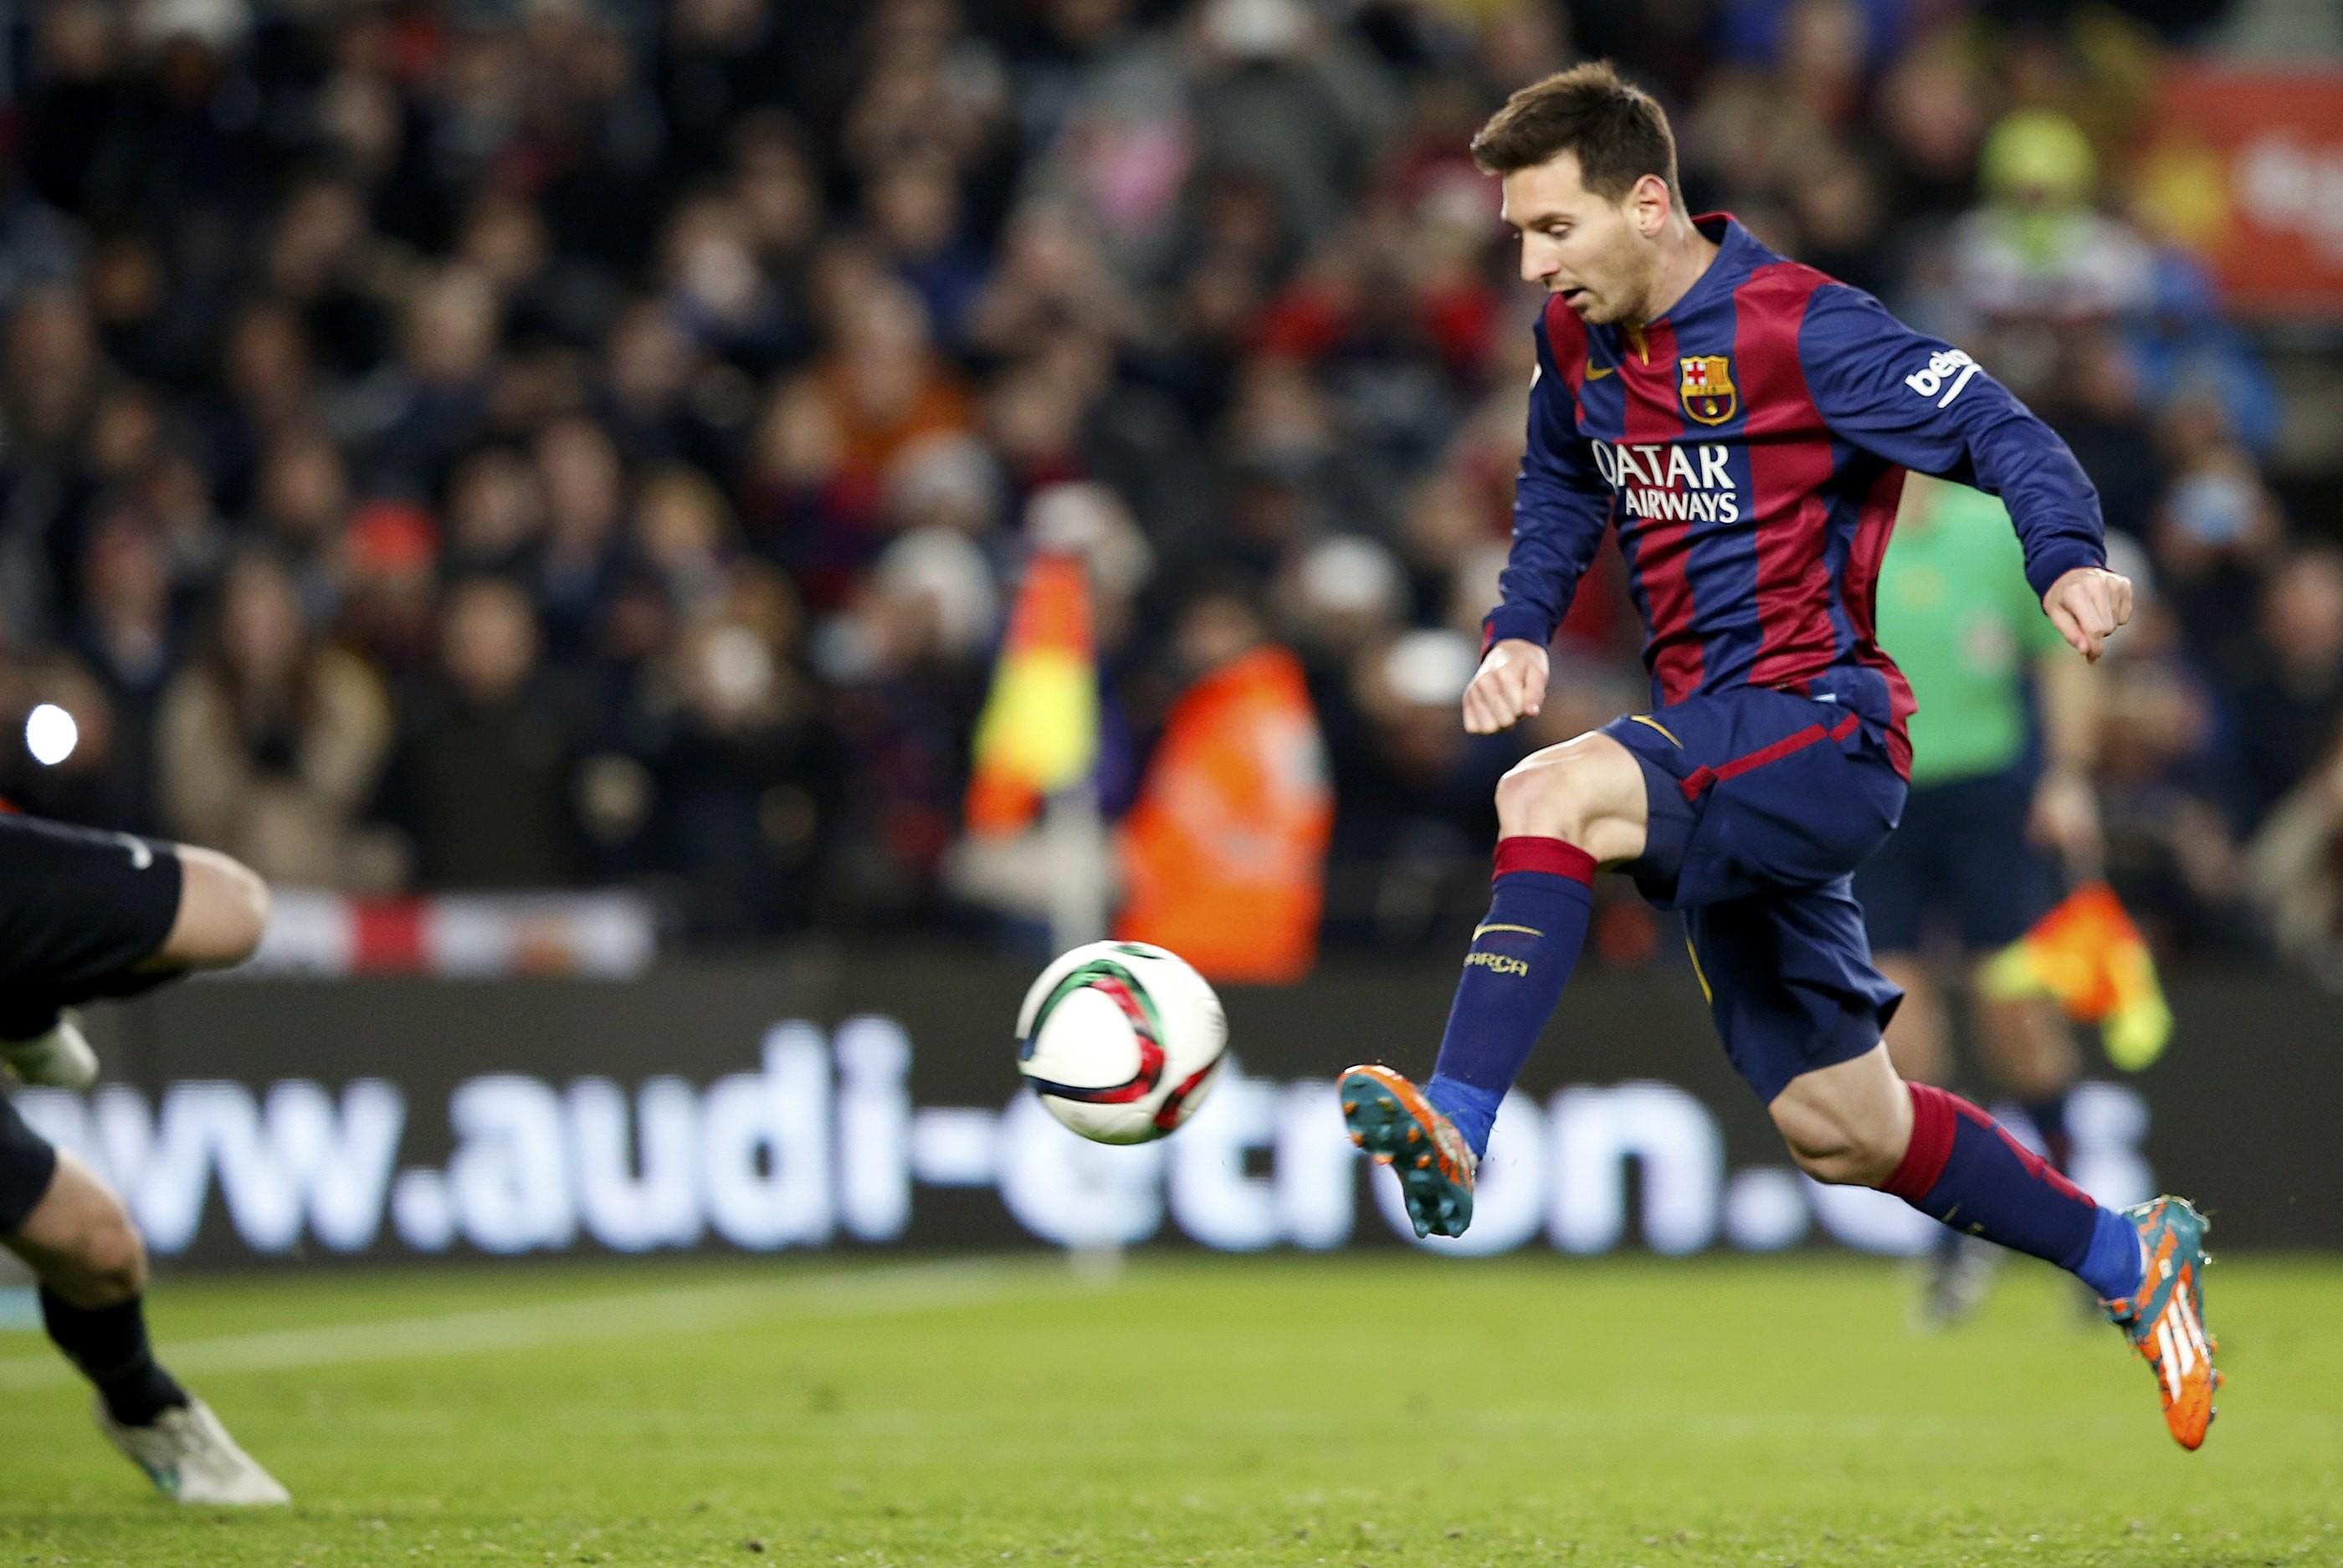 Messi Full Hd Wallpaper Futbol Soccer Nike Wallpaper 2018 69 Images